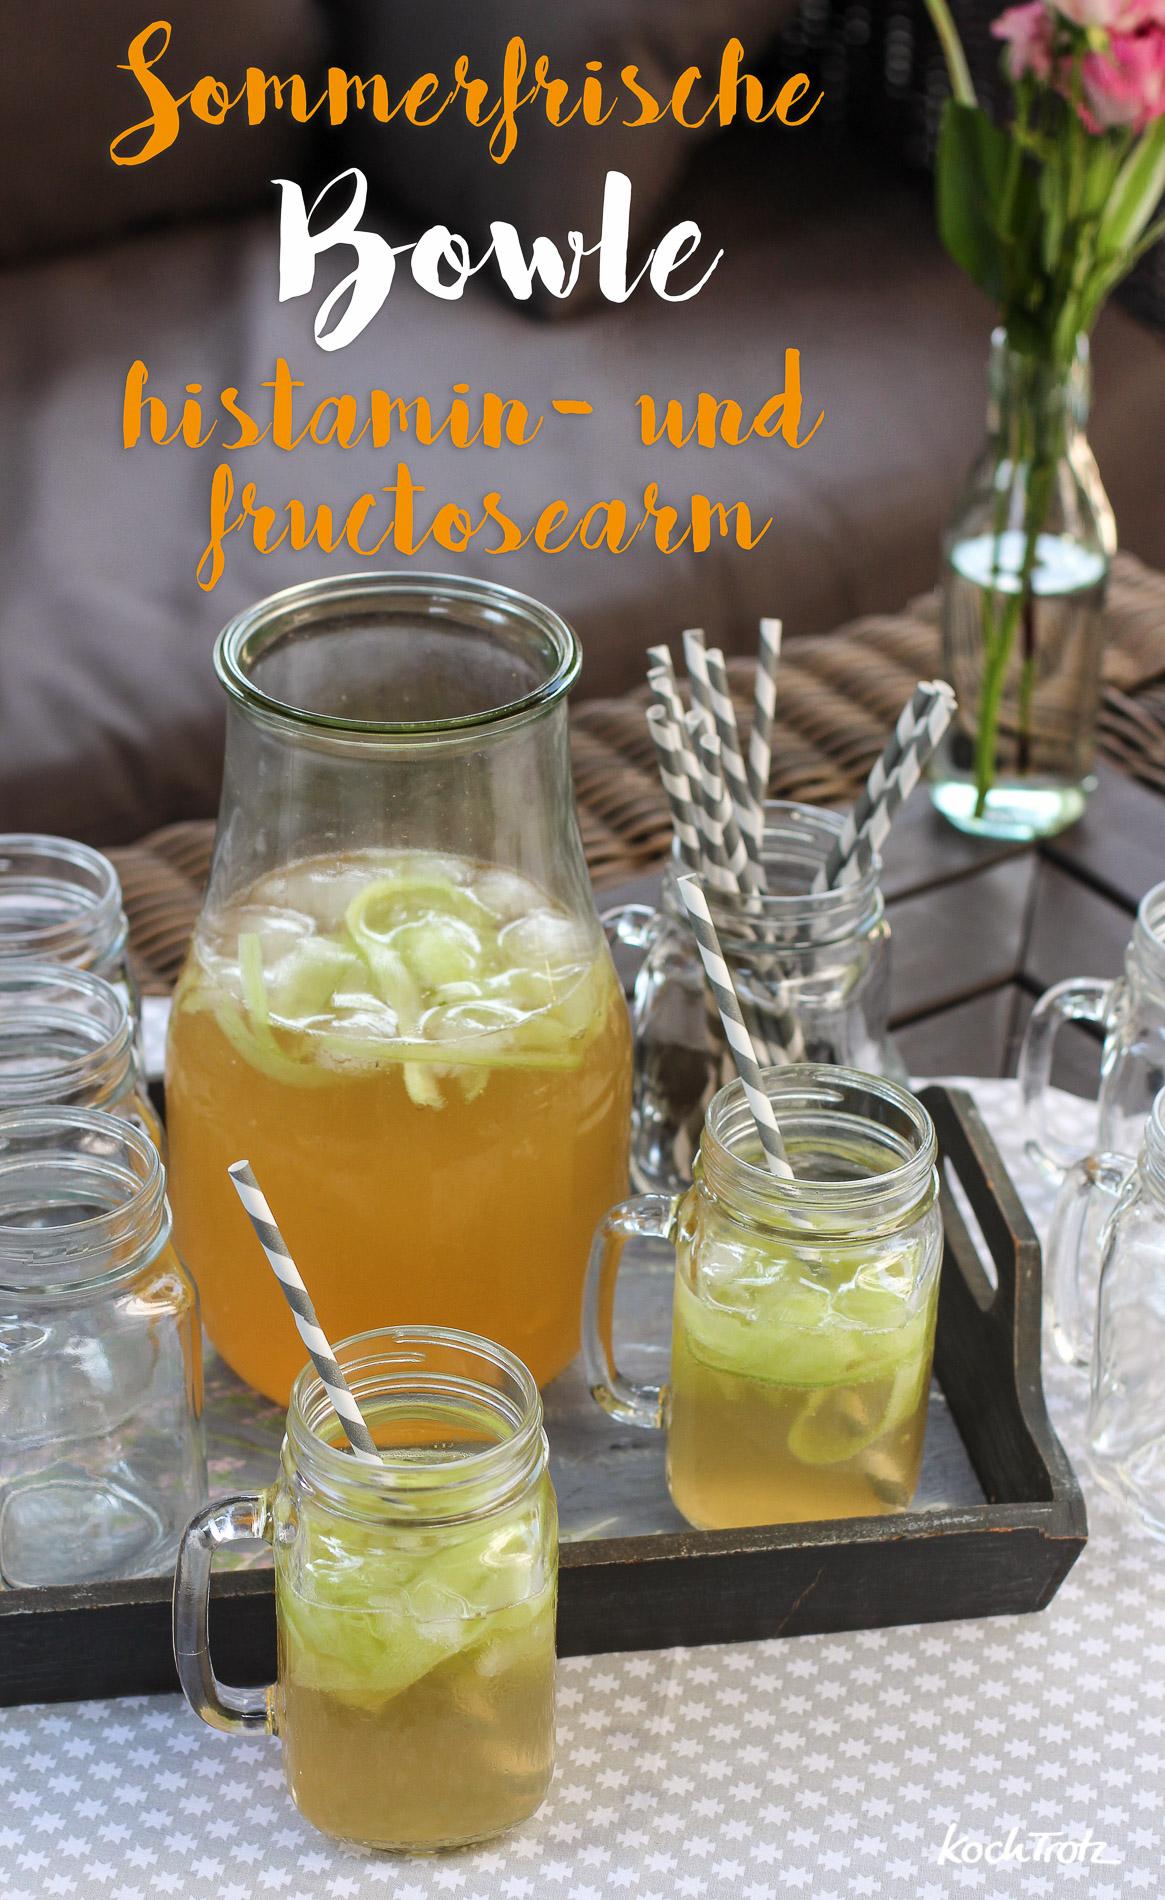 bowle-fructosearm-histaminarm-mit-oder-ohne-alkohol-1-3